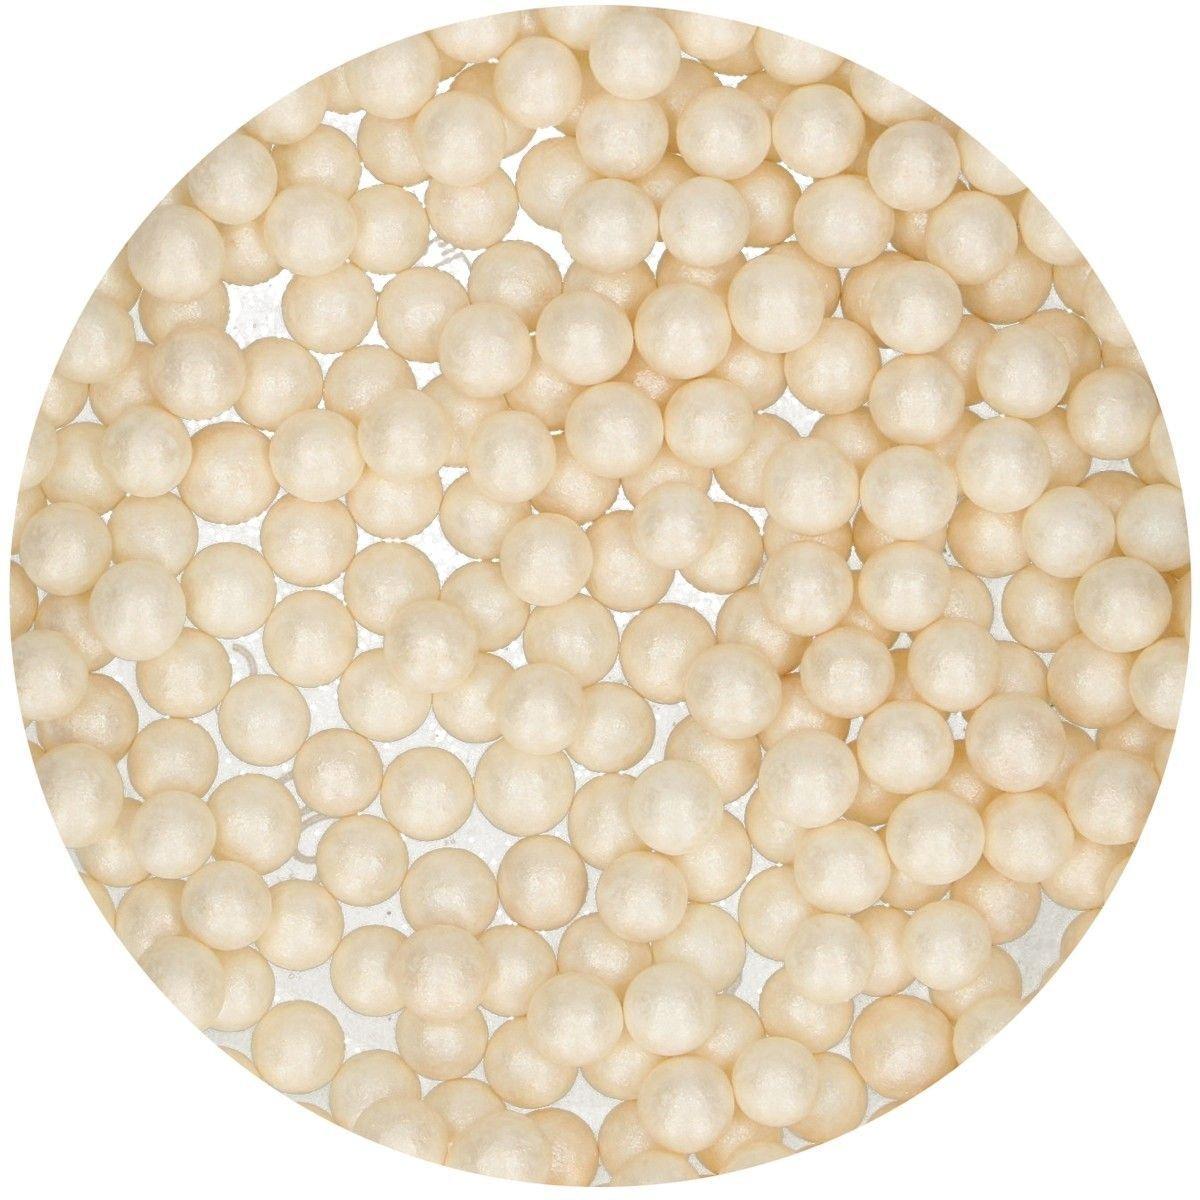 FunCakes Sugarballs -7mm WHITE MAXI 80g - Ζαχαρωτά Μπιλίτσες/Πέρλες Μεγάλες Λευκές